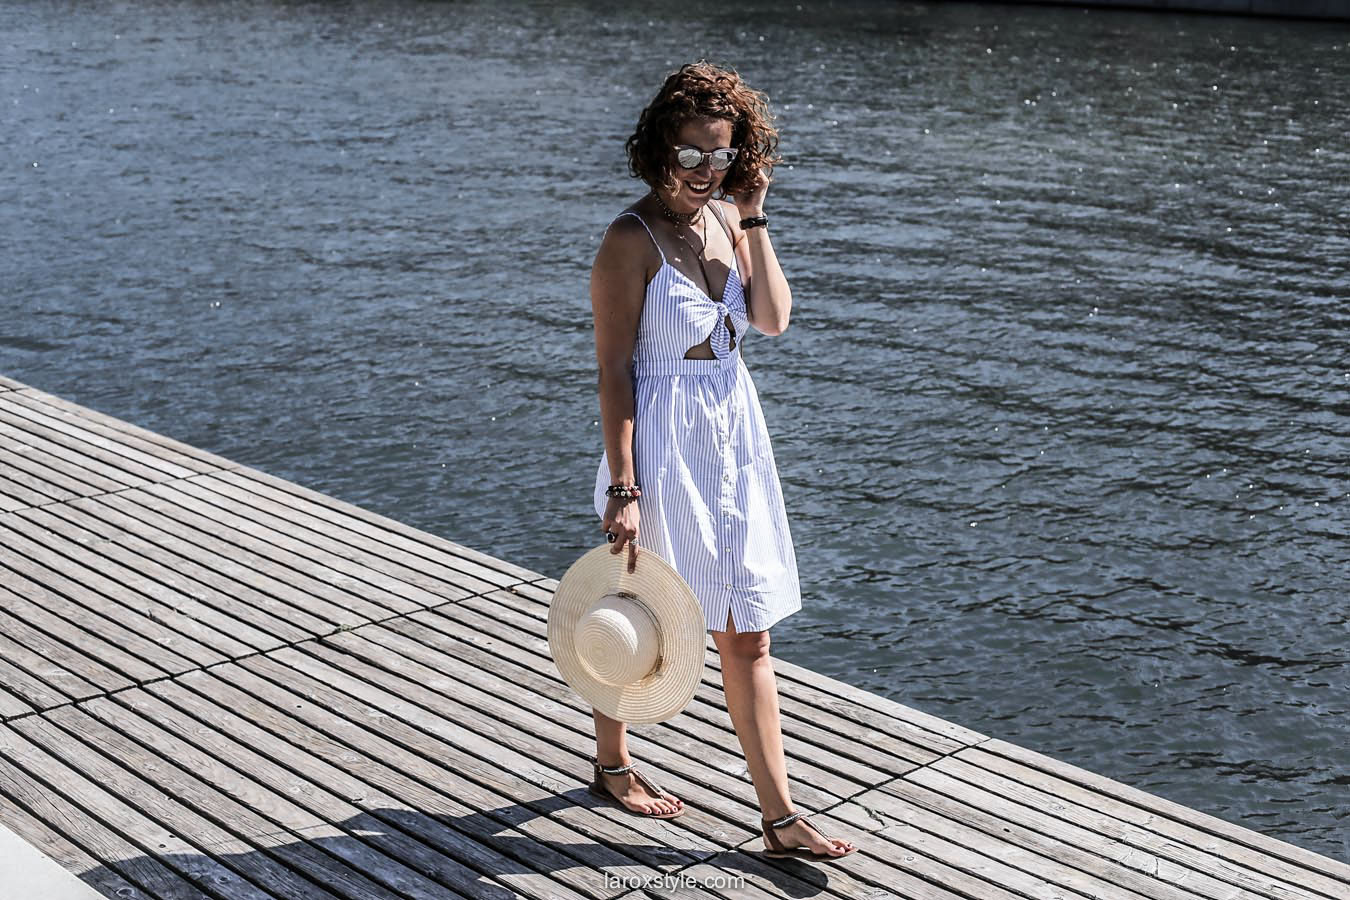 summer look - vacances chez soi - blog lifestyle lyon -10